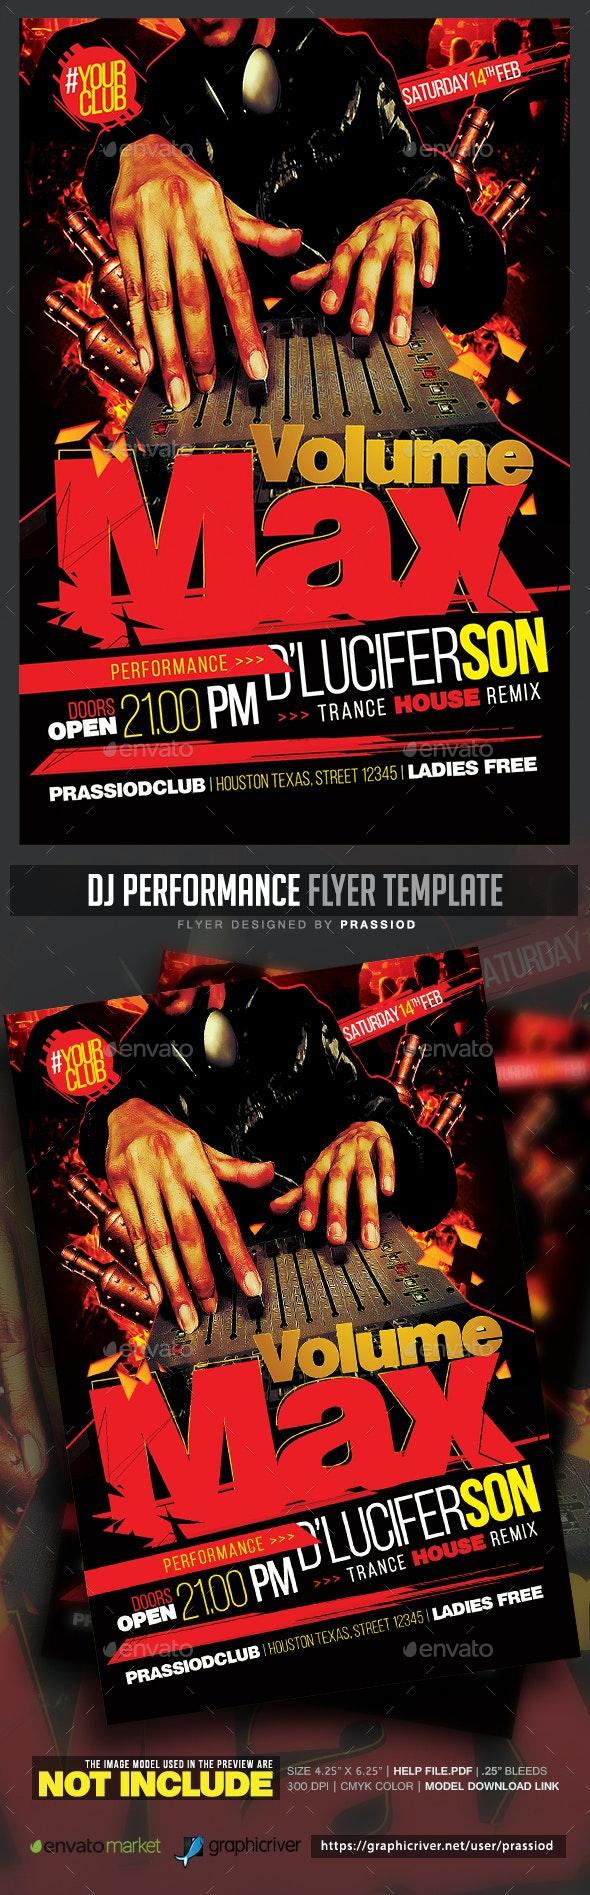 DJ Performance Flyer Template - Events Flyers